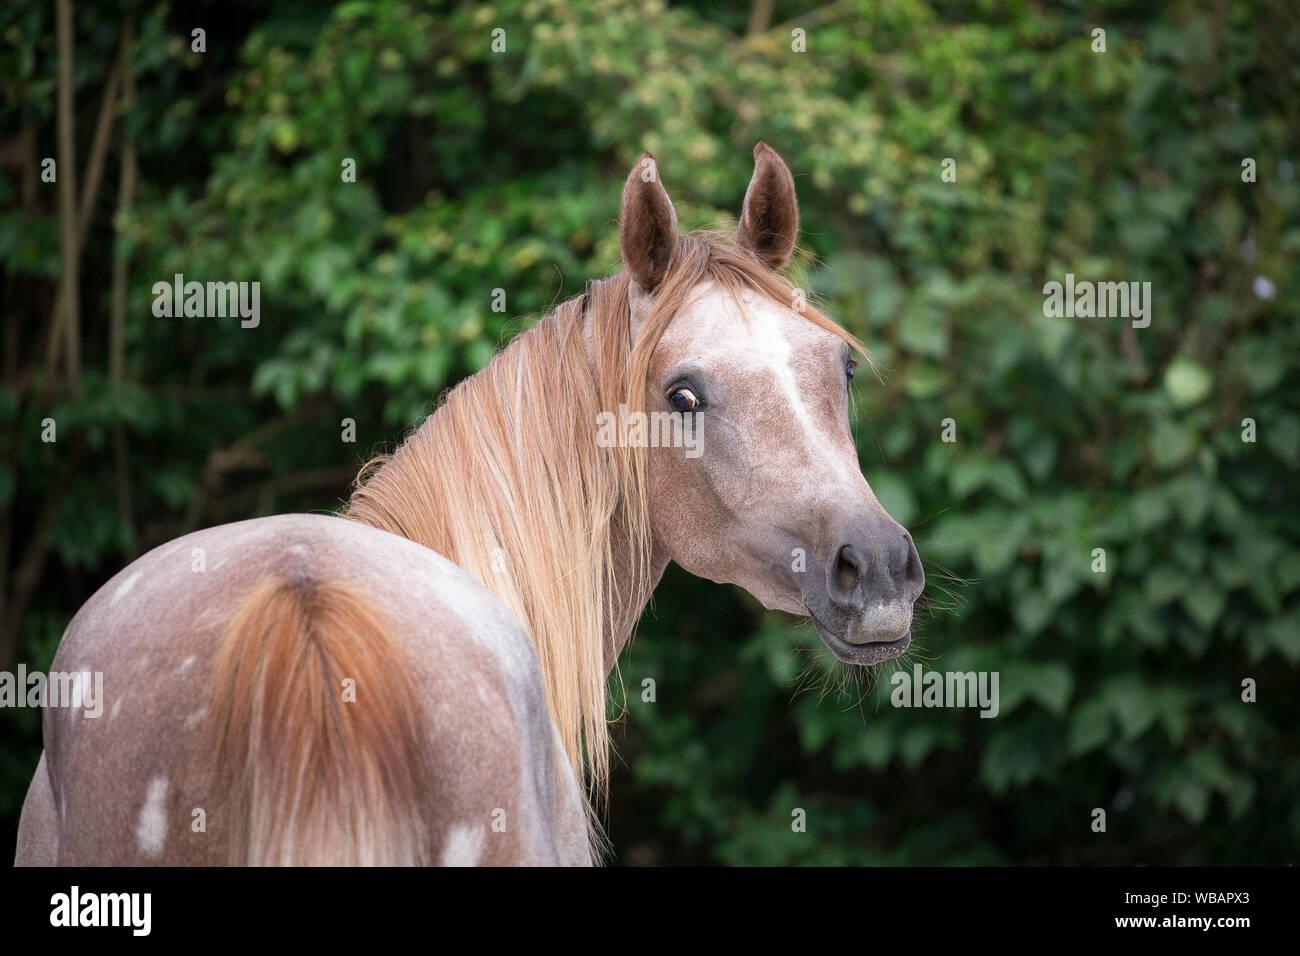 Arabian Horse Portrait Of Red Roan Juvenile Mare Austria Stock Photo Alamy